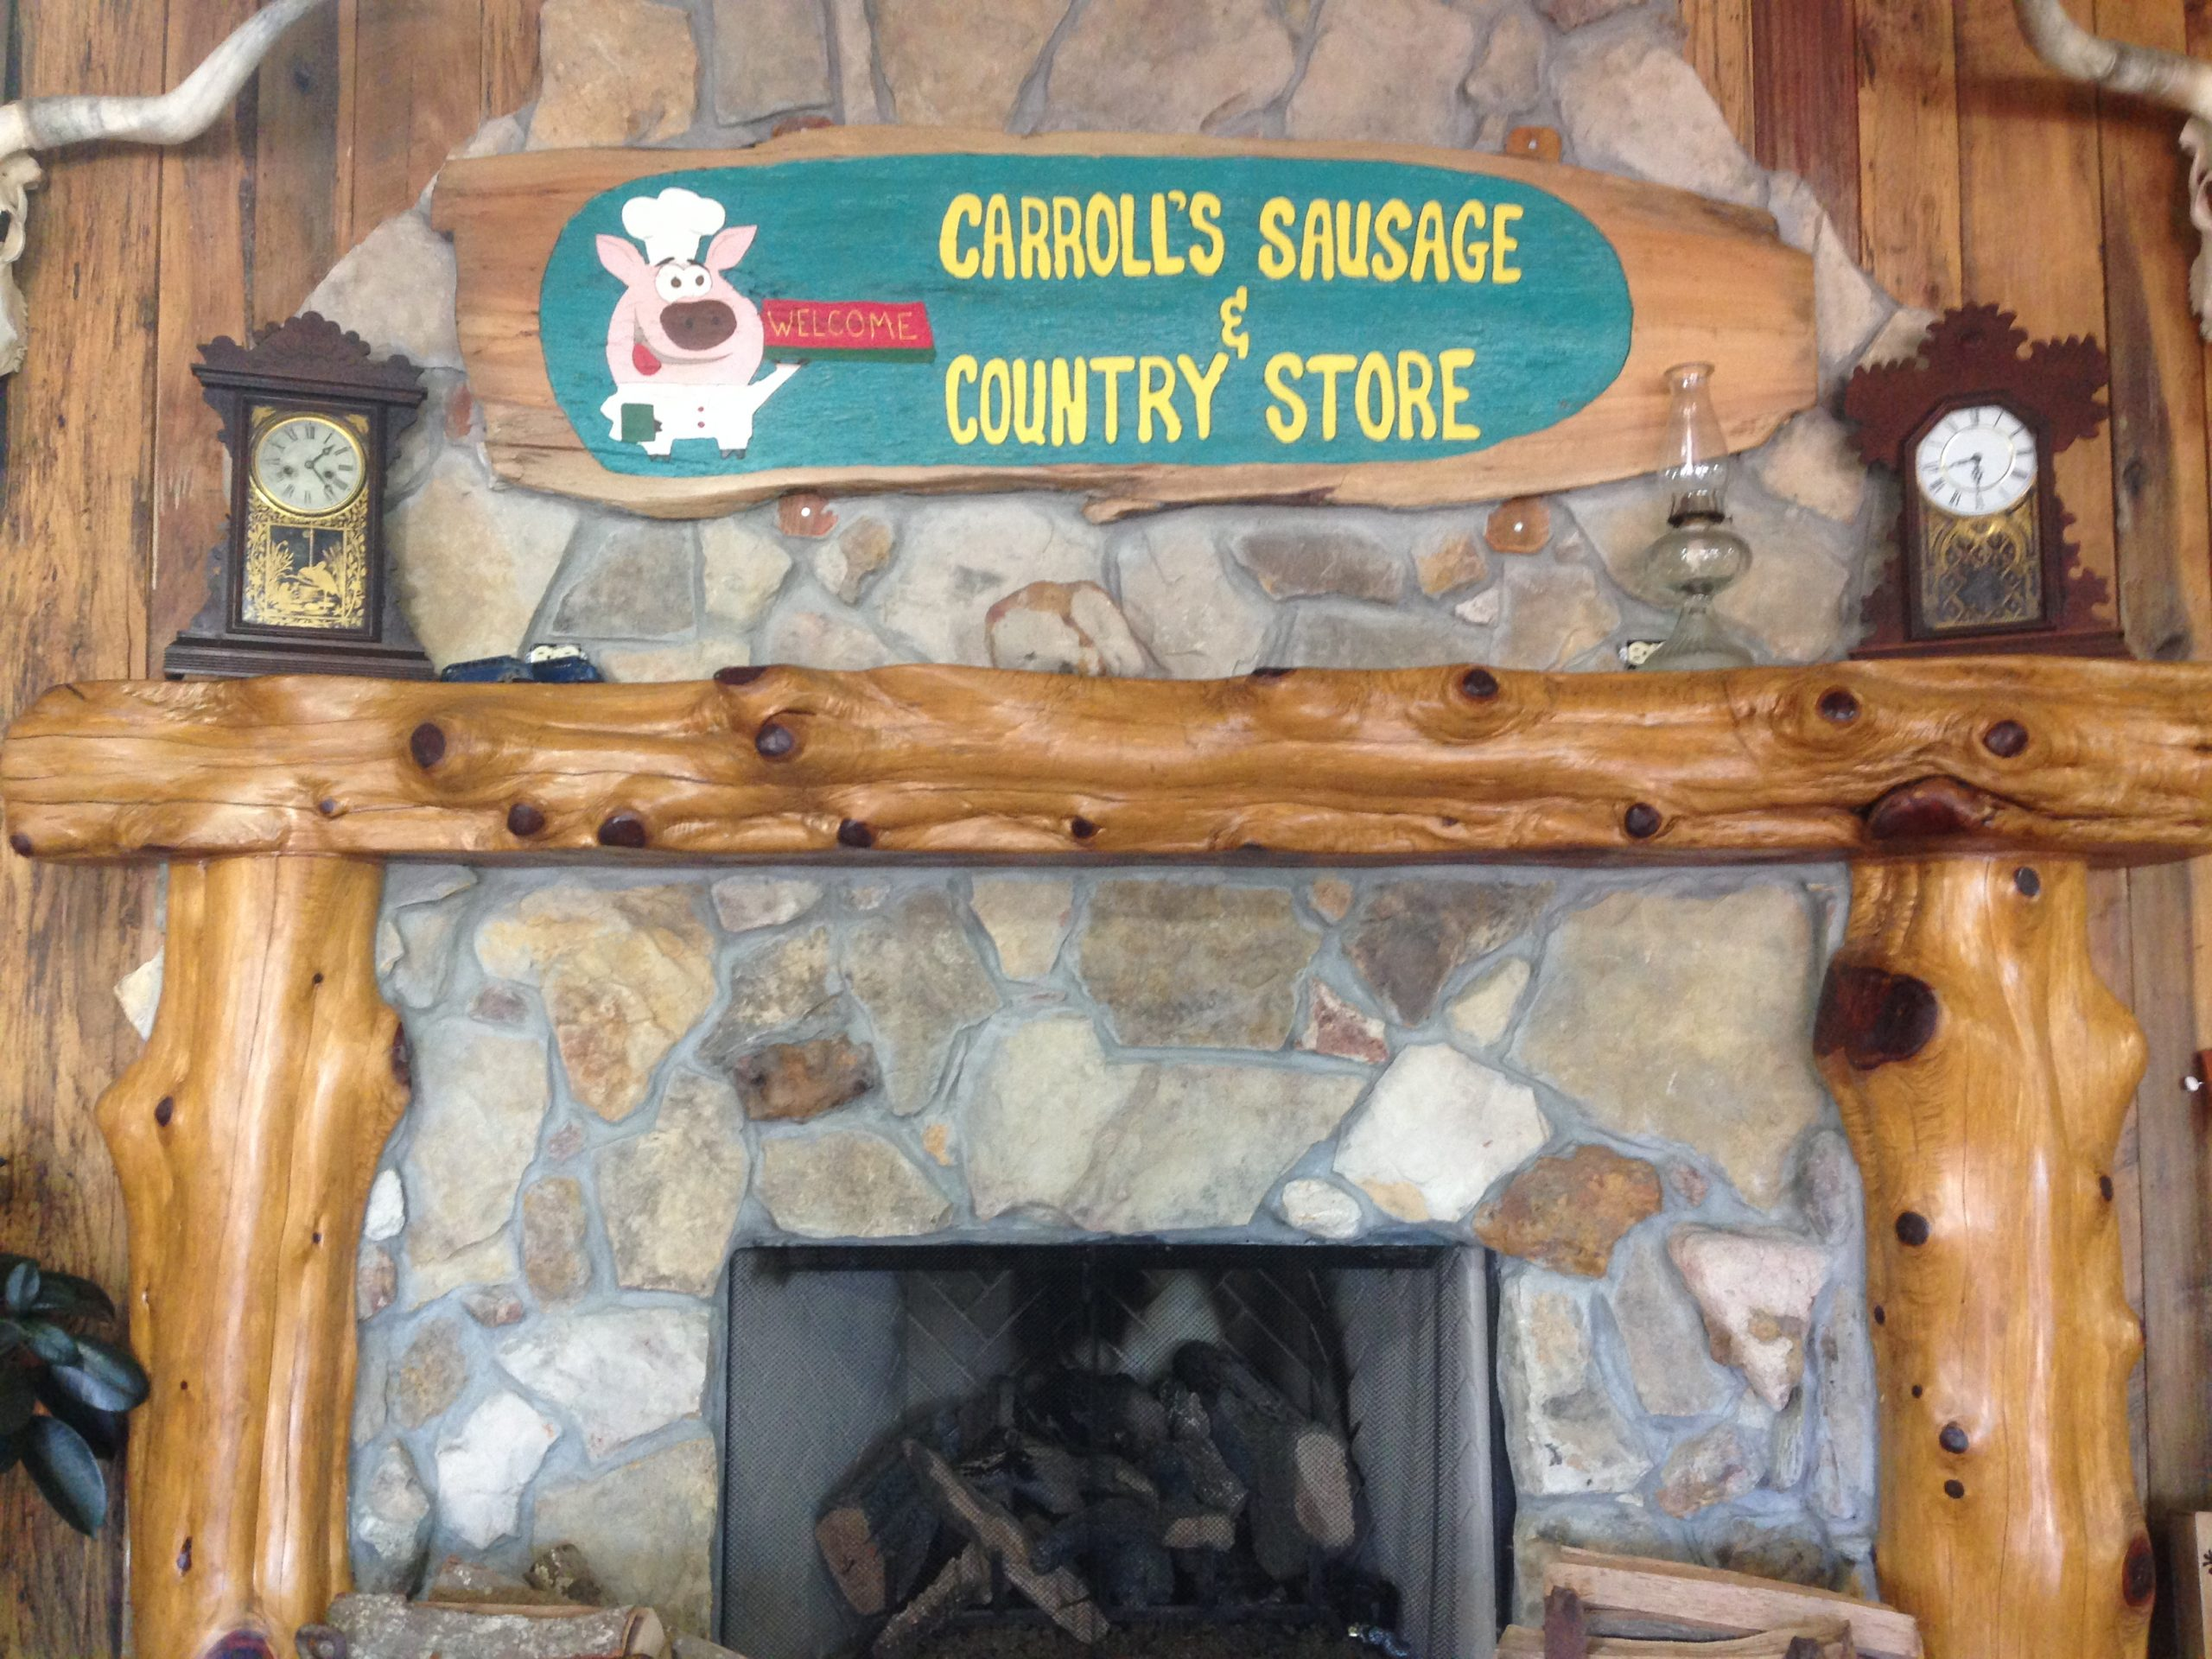 Carroll's Sausage Store Fireplace